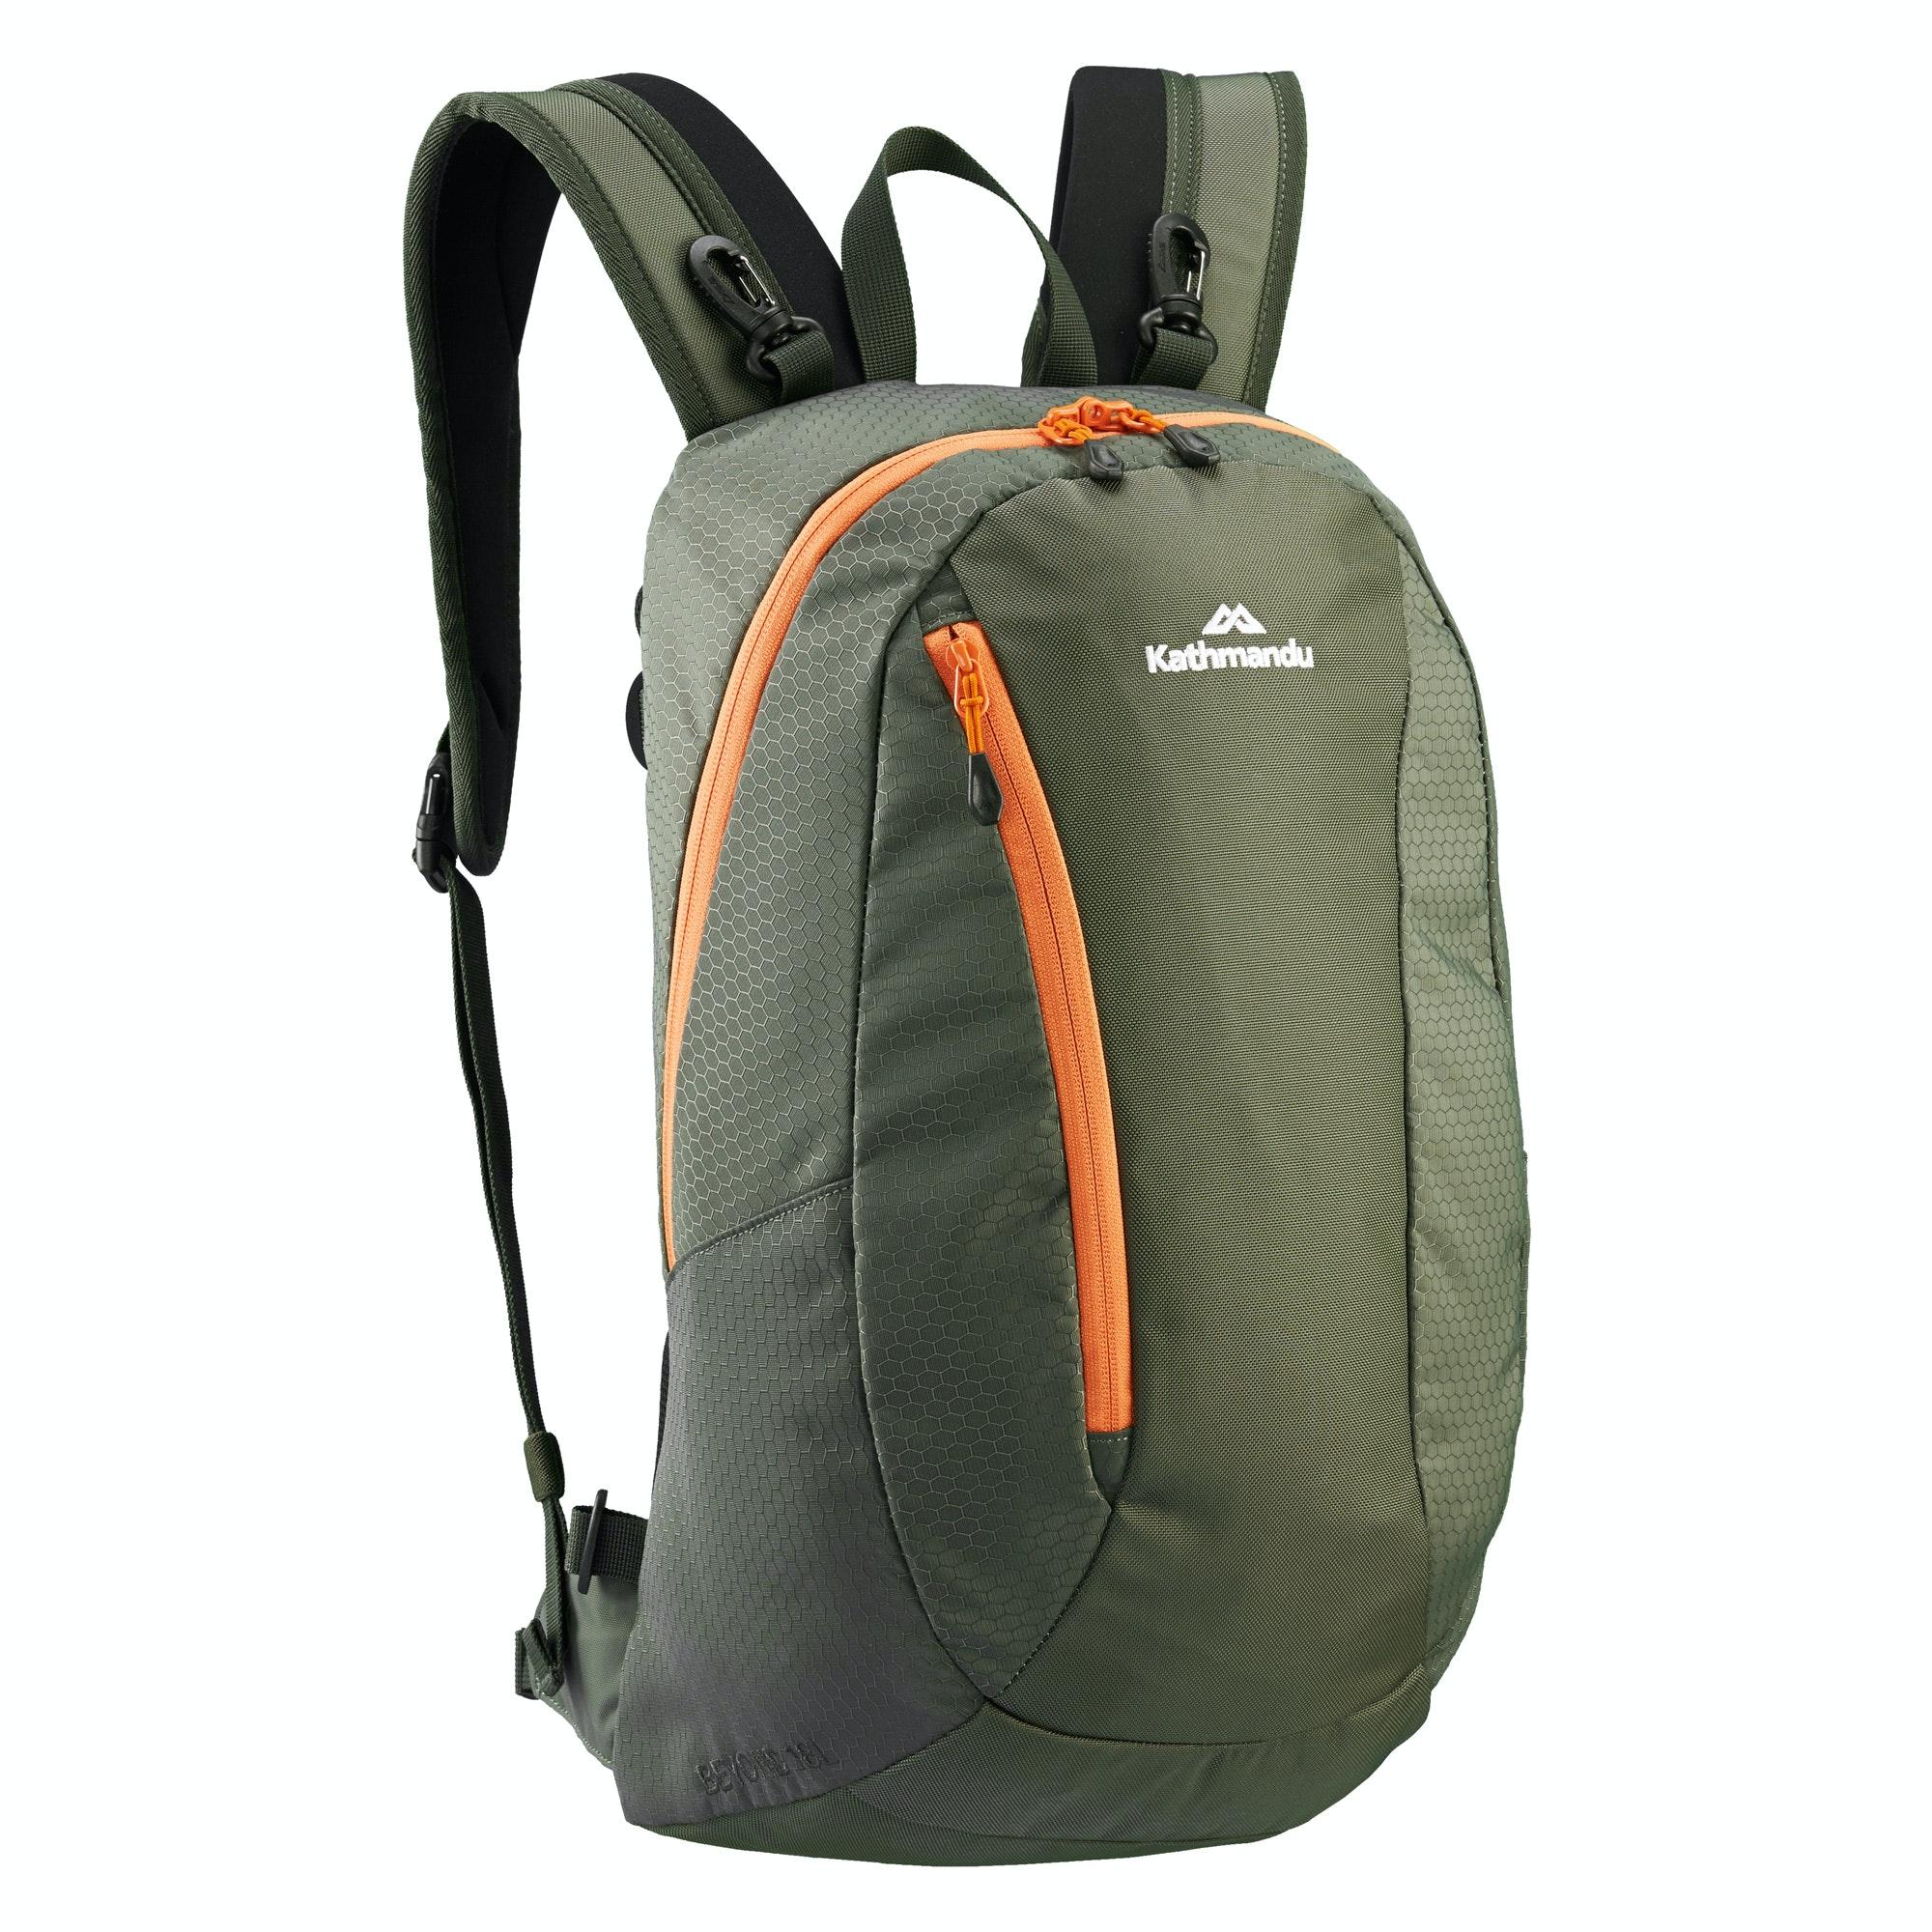 Kathmandu Gluon Beyond Travel Active Pack Backpack